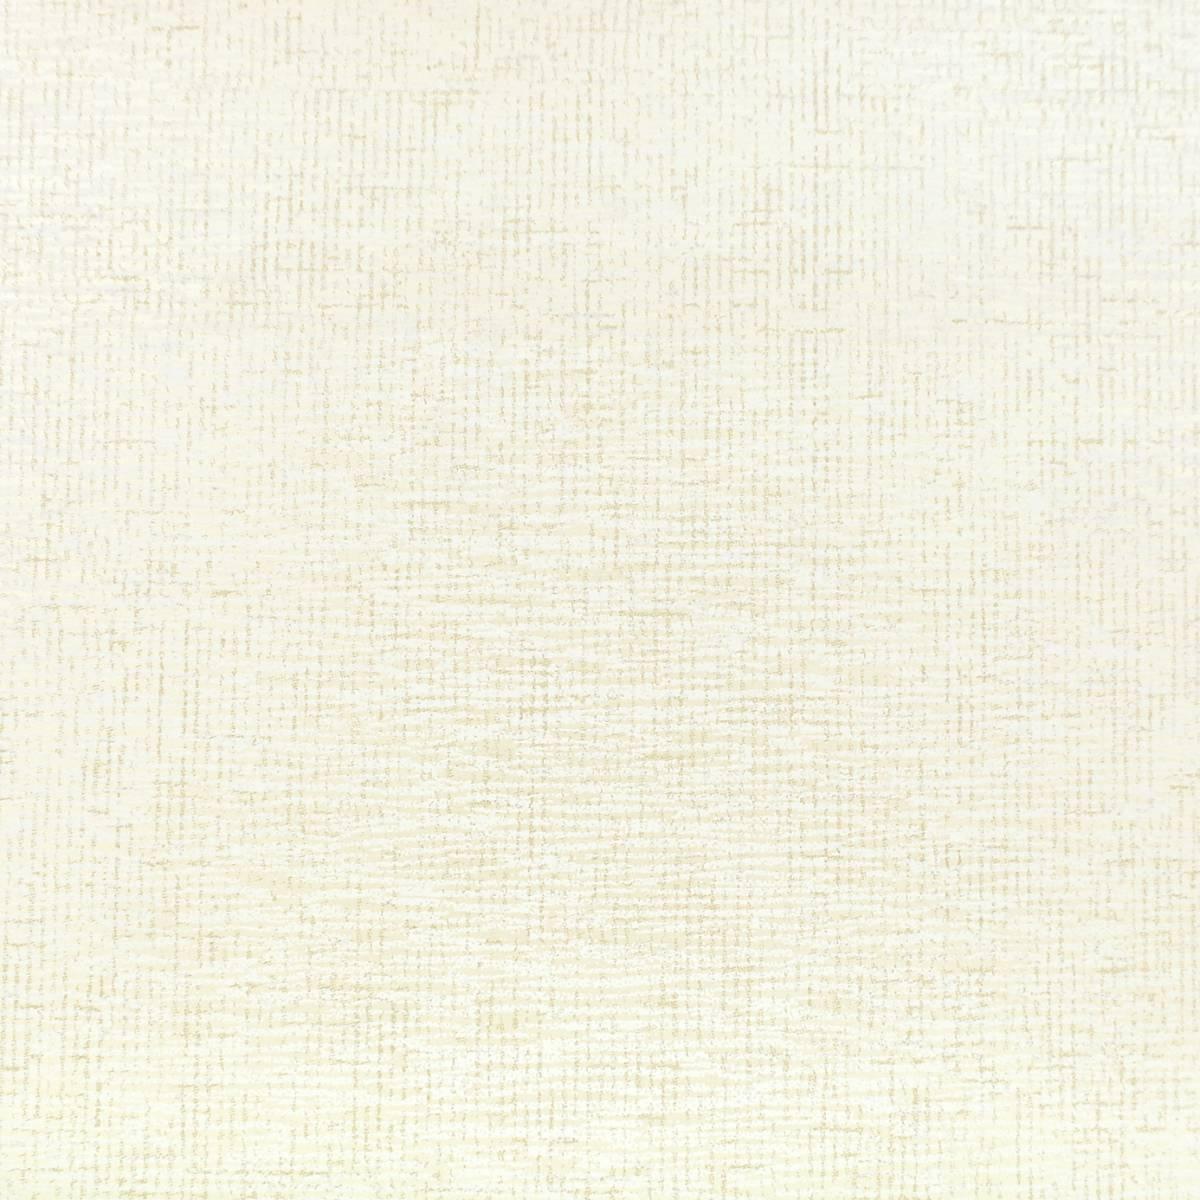 Grinding Wallpaper Papyrus Grinding31 Wemyss Textures